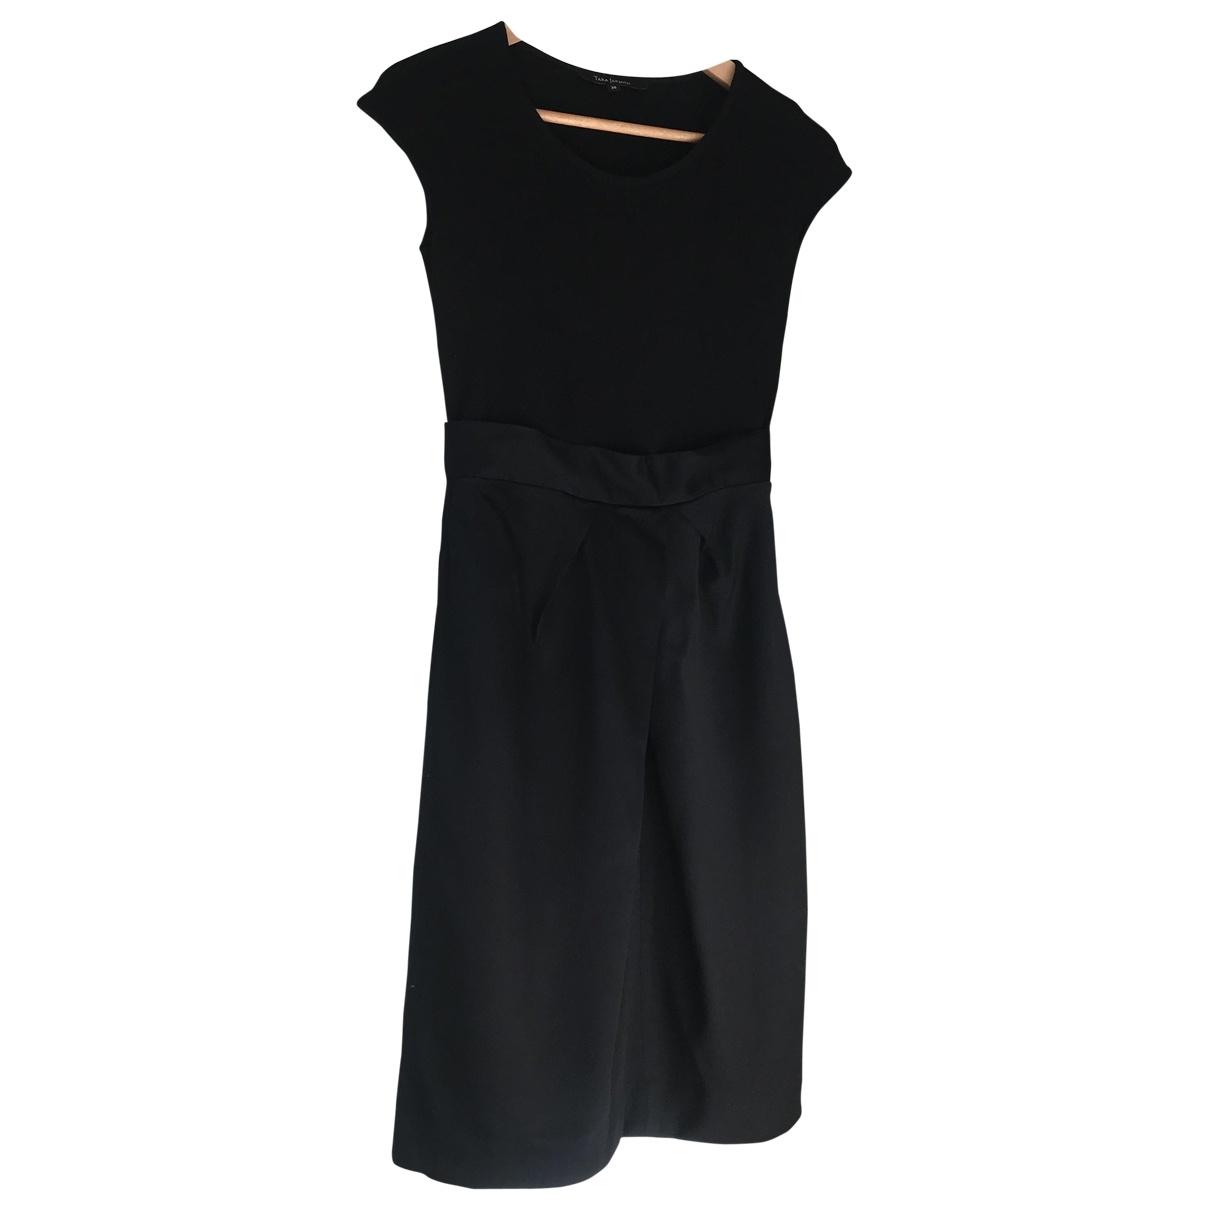 Tara Jarmon \N Black Wool dress for Women 36 FR